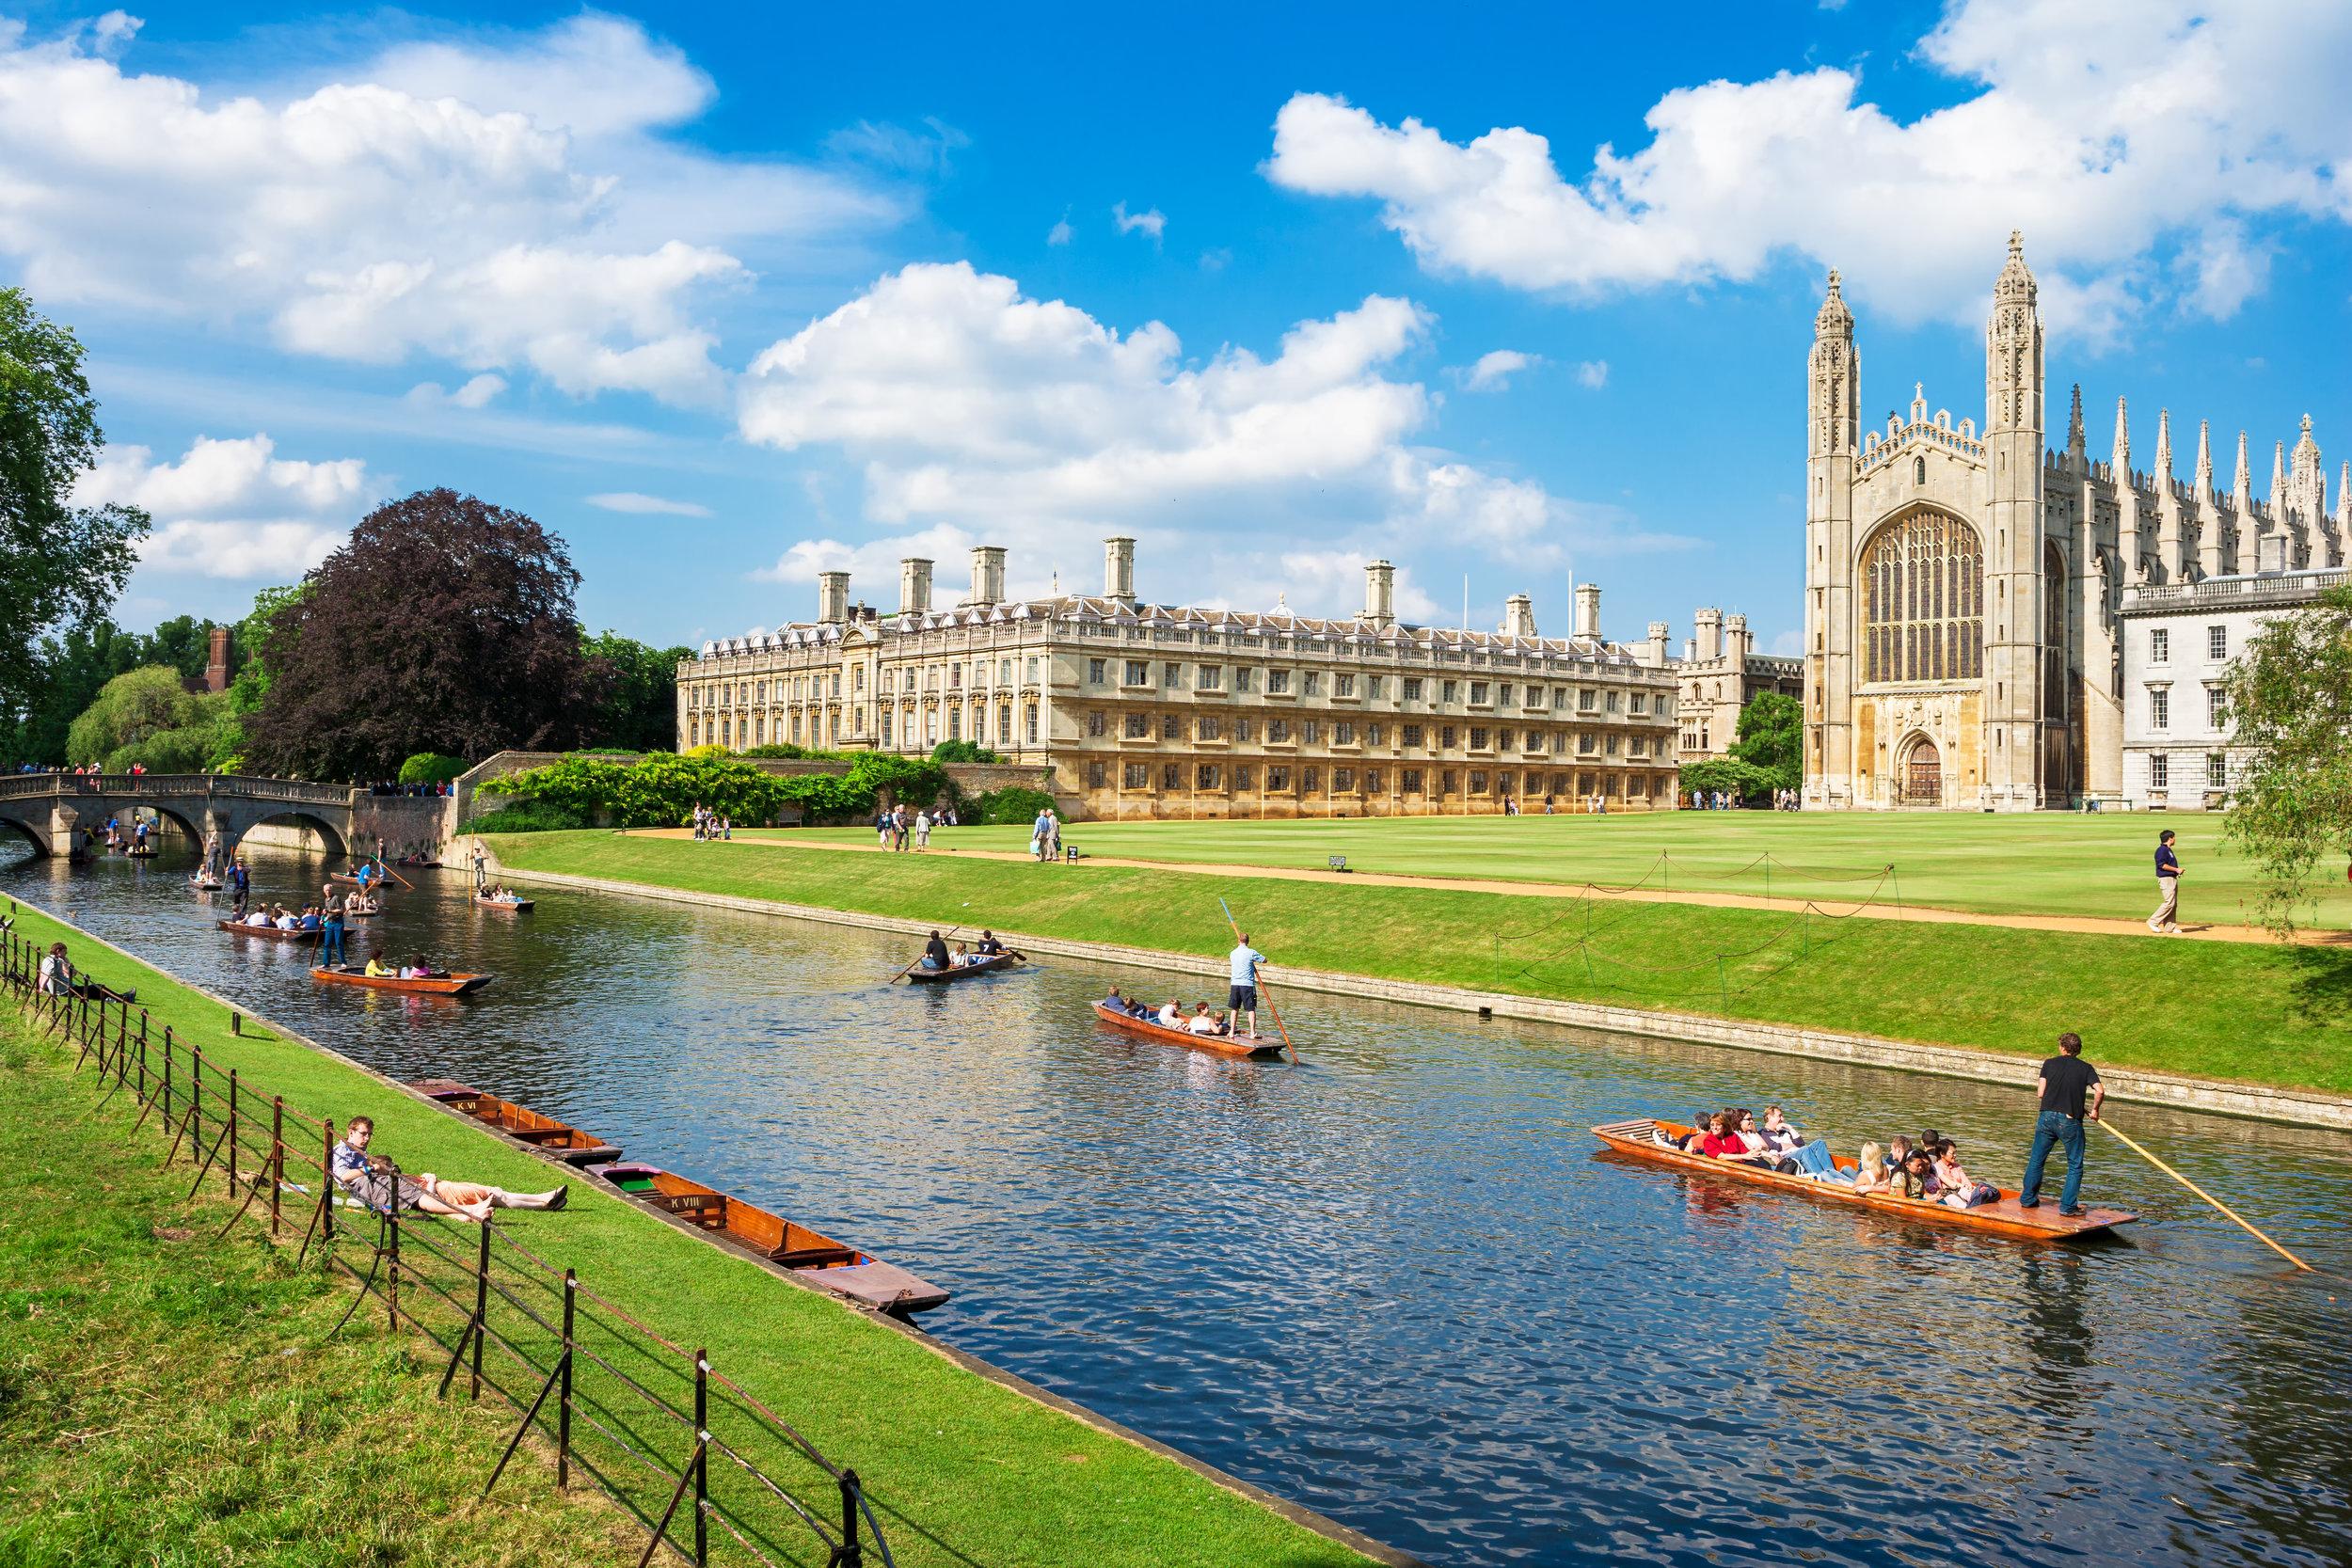 Case Study – CAMBRIDGE, CAMBRIDGSHIRE, U.K.